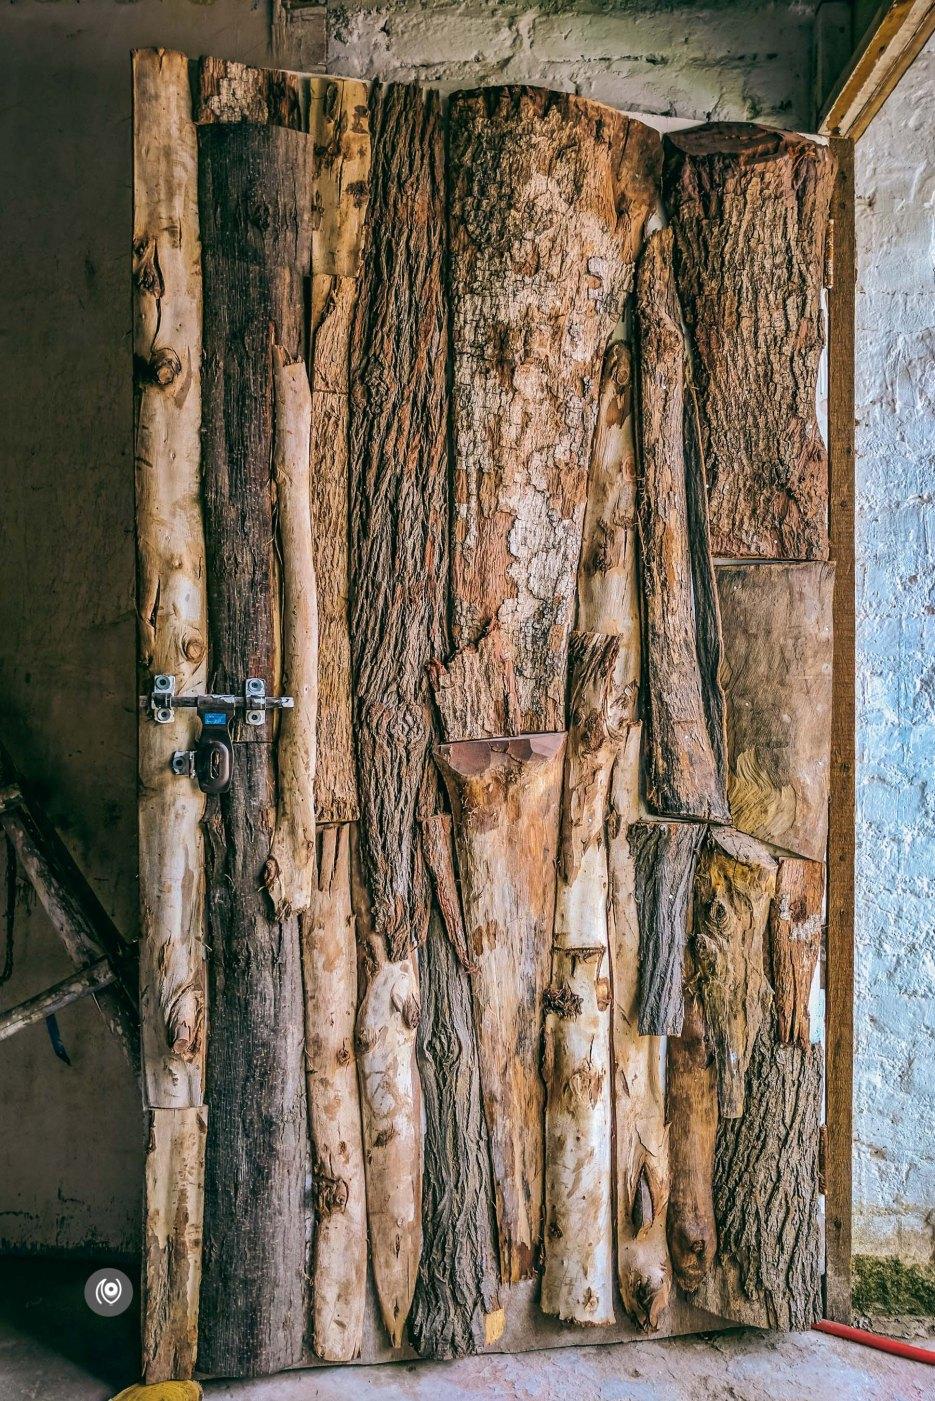 Advaeita Mathur, Studio Metallurgy, Gladd, Wood, Metal, Jewellery Designer, Jewelry Designer, Sculptor, Artist, Designer, Industrial Design, Naina.co, Naina Redhu, Indian Metal Artist, Studio, EyesForInfluencers, People Profiles, Interview Series, New Delhi, Professional Photographer, Professional Blogger, Lifestyle Photographer, Lifestyle Blogger, Environmental Portaiture, Portraits at work